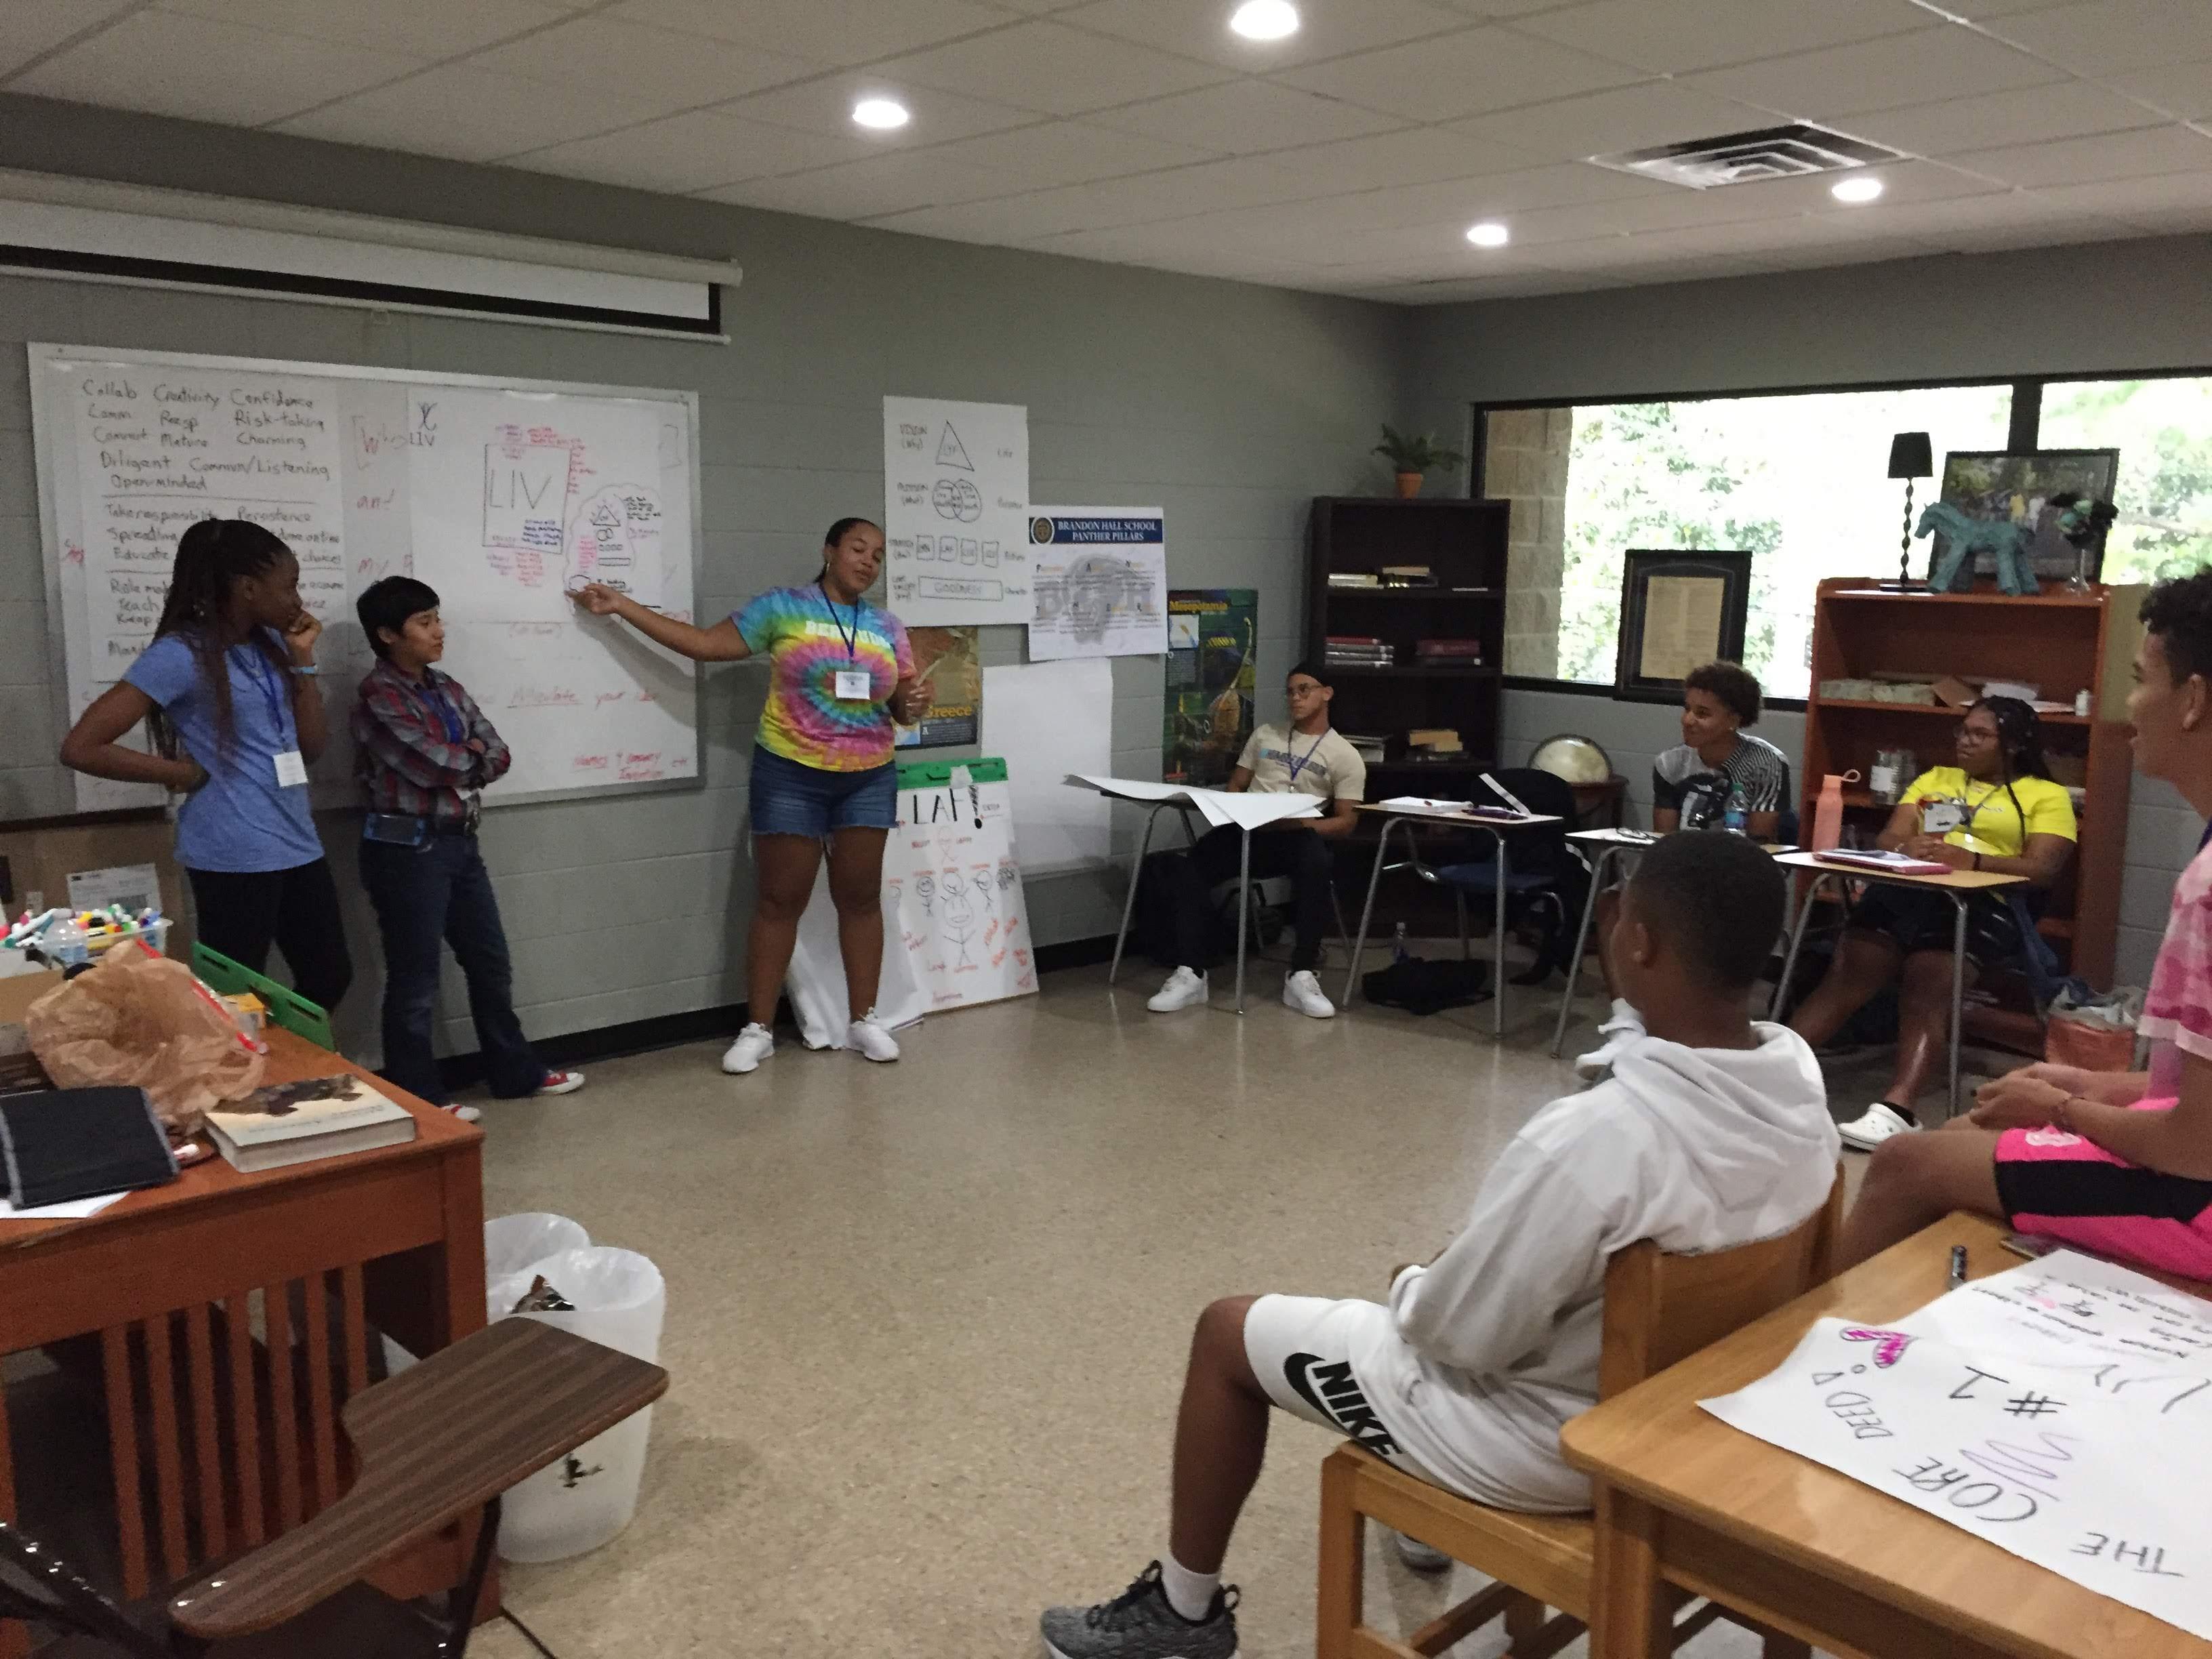 LRN LAF LUV LIV Learn Laugh Love Live for Leaders Workshop 2 Students Presenting